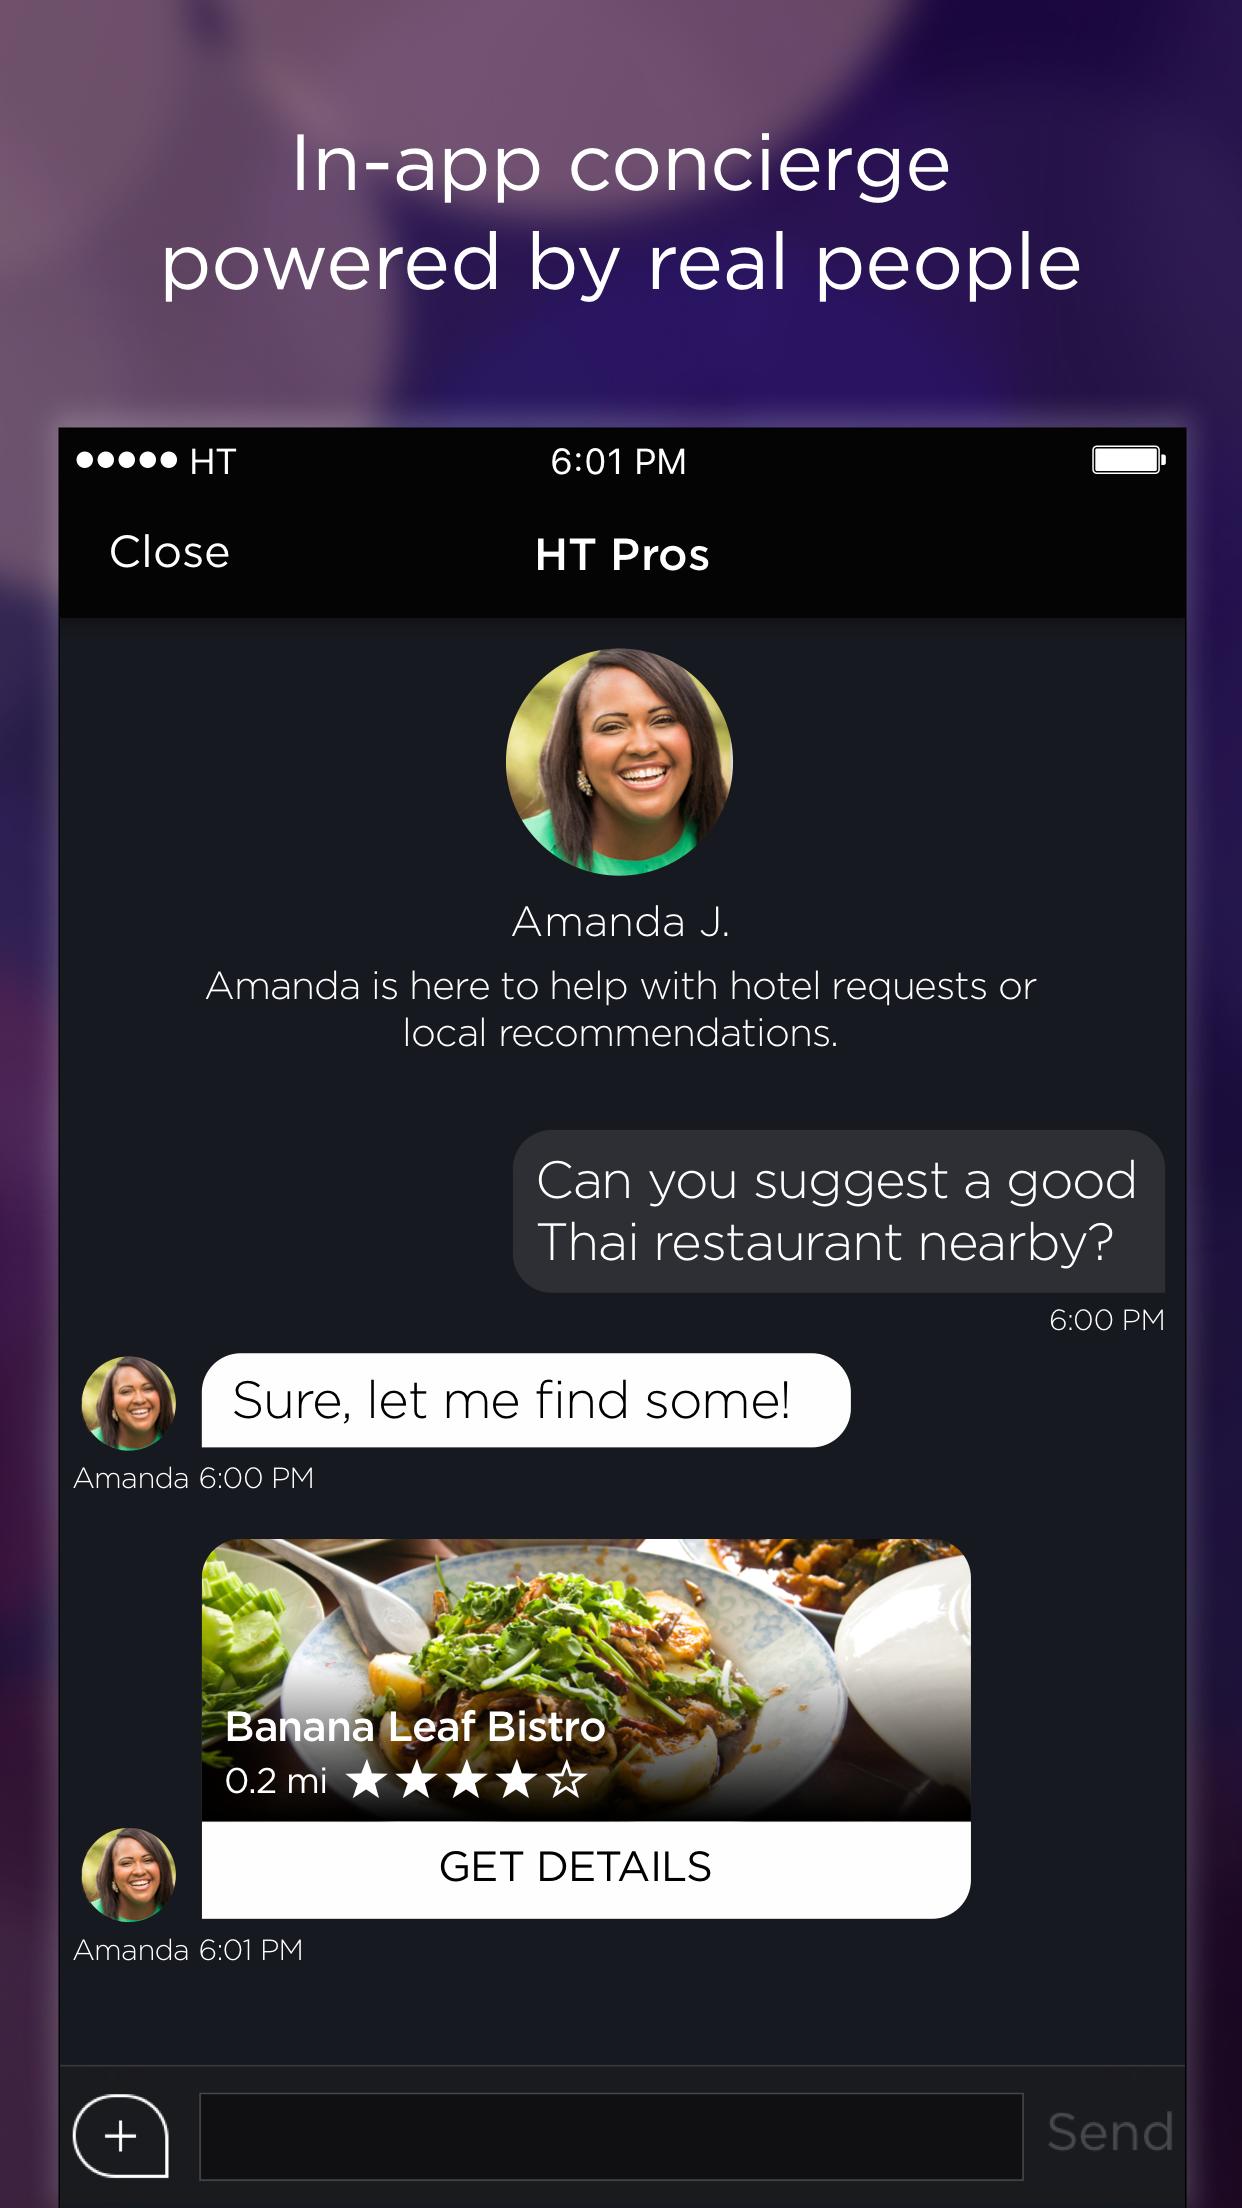 HotelTonight - Hotel Deals Screenshot